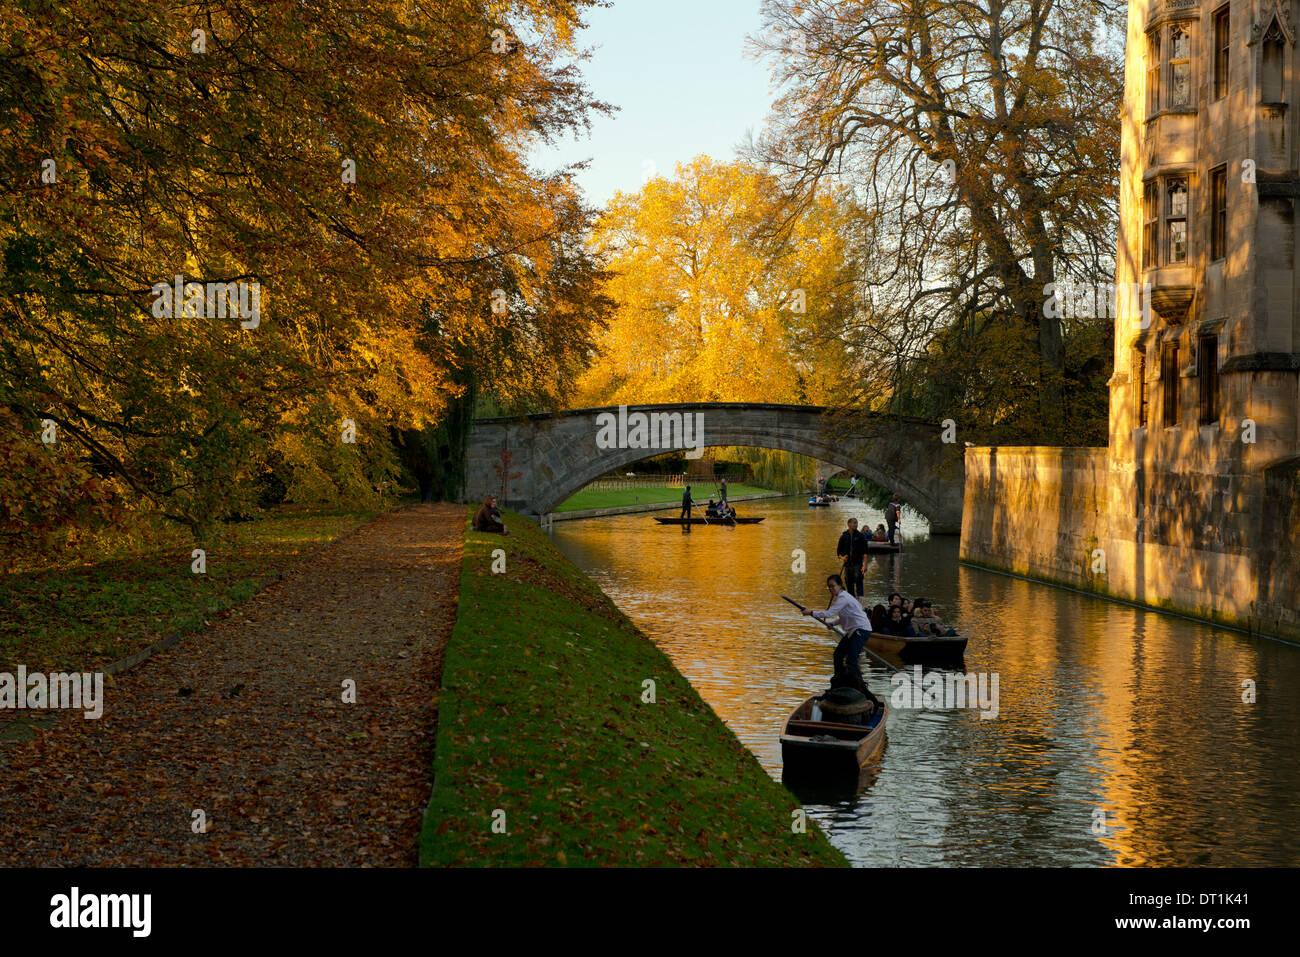 Punts on the Cam on an autumn day, Cambridge, Cambridgeshire, England, United Kingdom, Europe - Stock Image